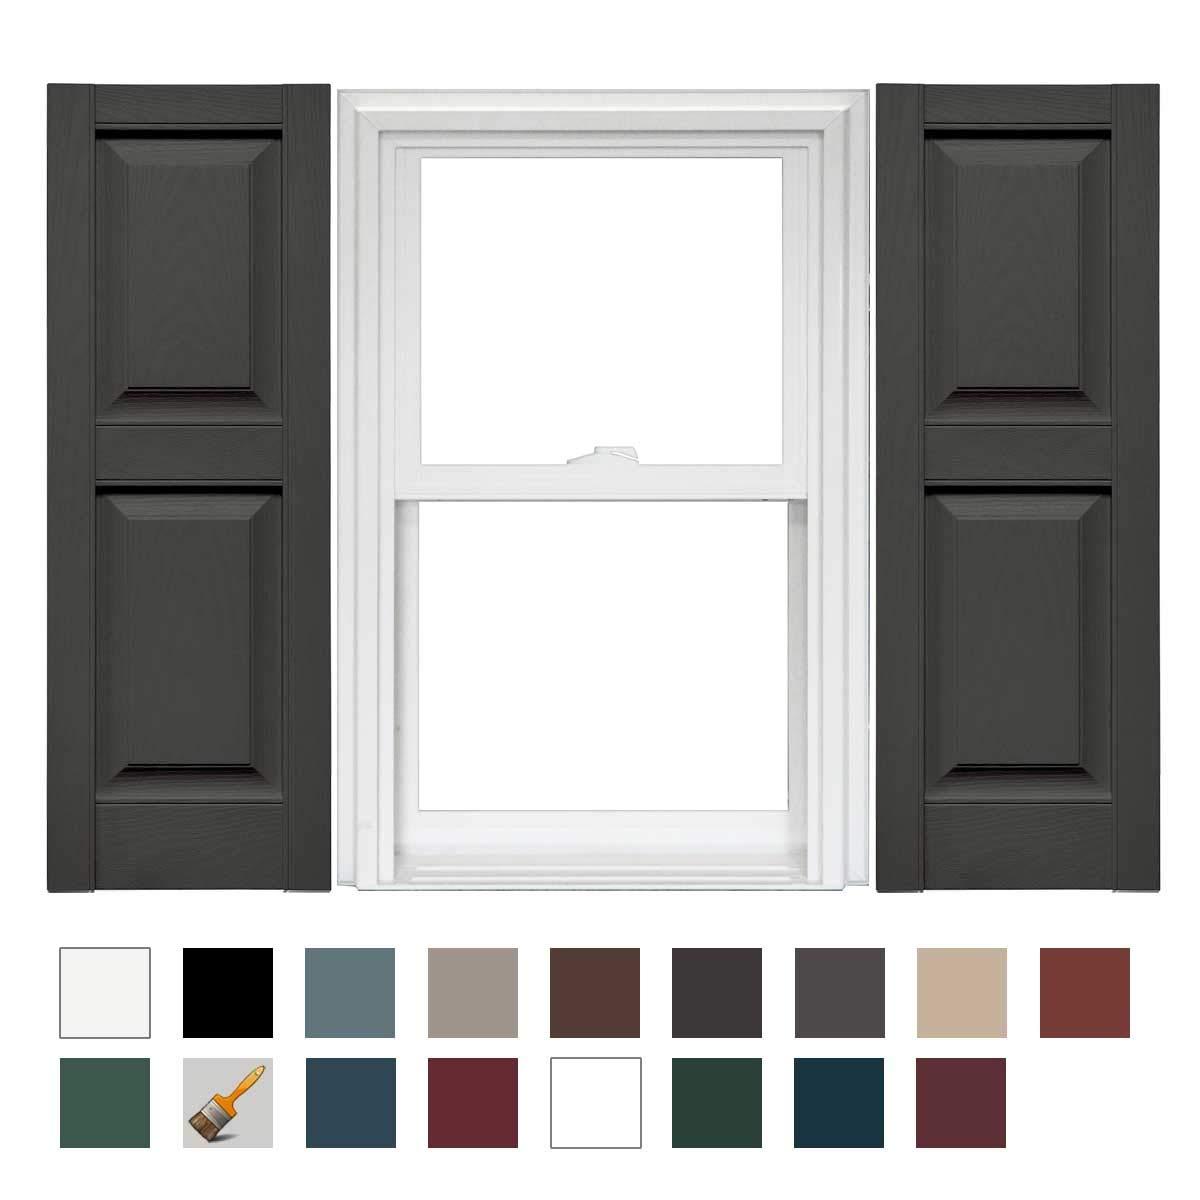 Mid-America Williamsburg Raised Panel Vinyl Standard Shutter - 1 Pair 14.75 x 80 018 Tuxedo Gray